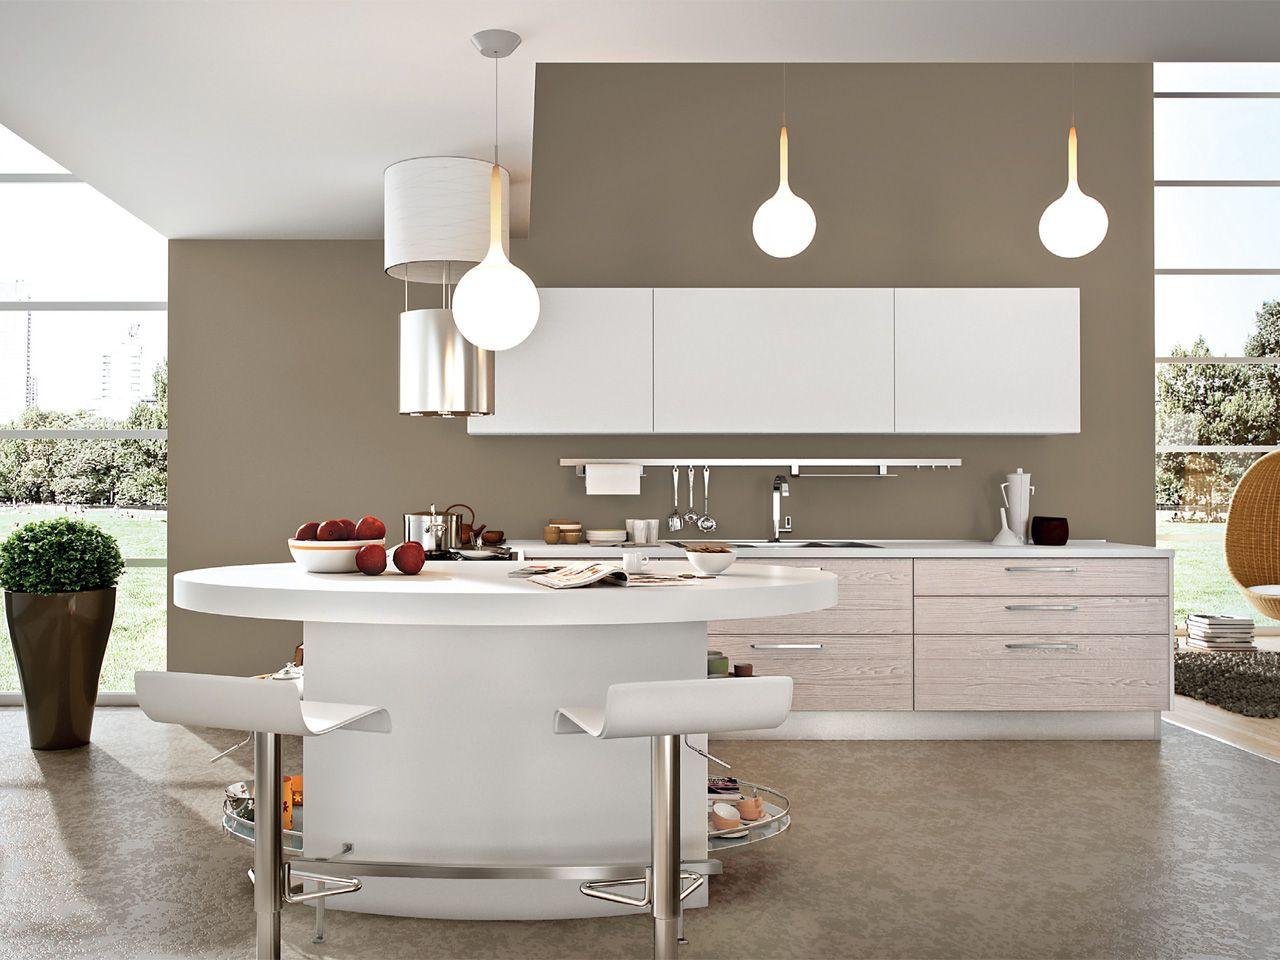 ADELE Project - Cucina Lube Moderna | Pinterest | Adele, Cucine e Design